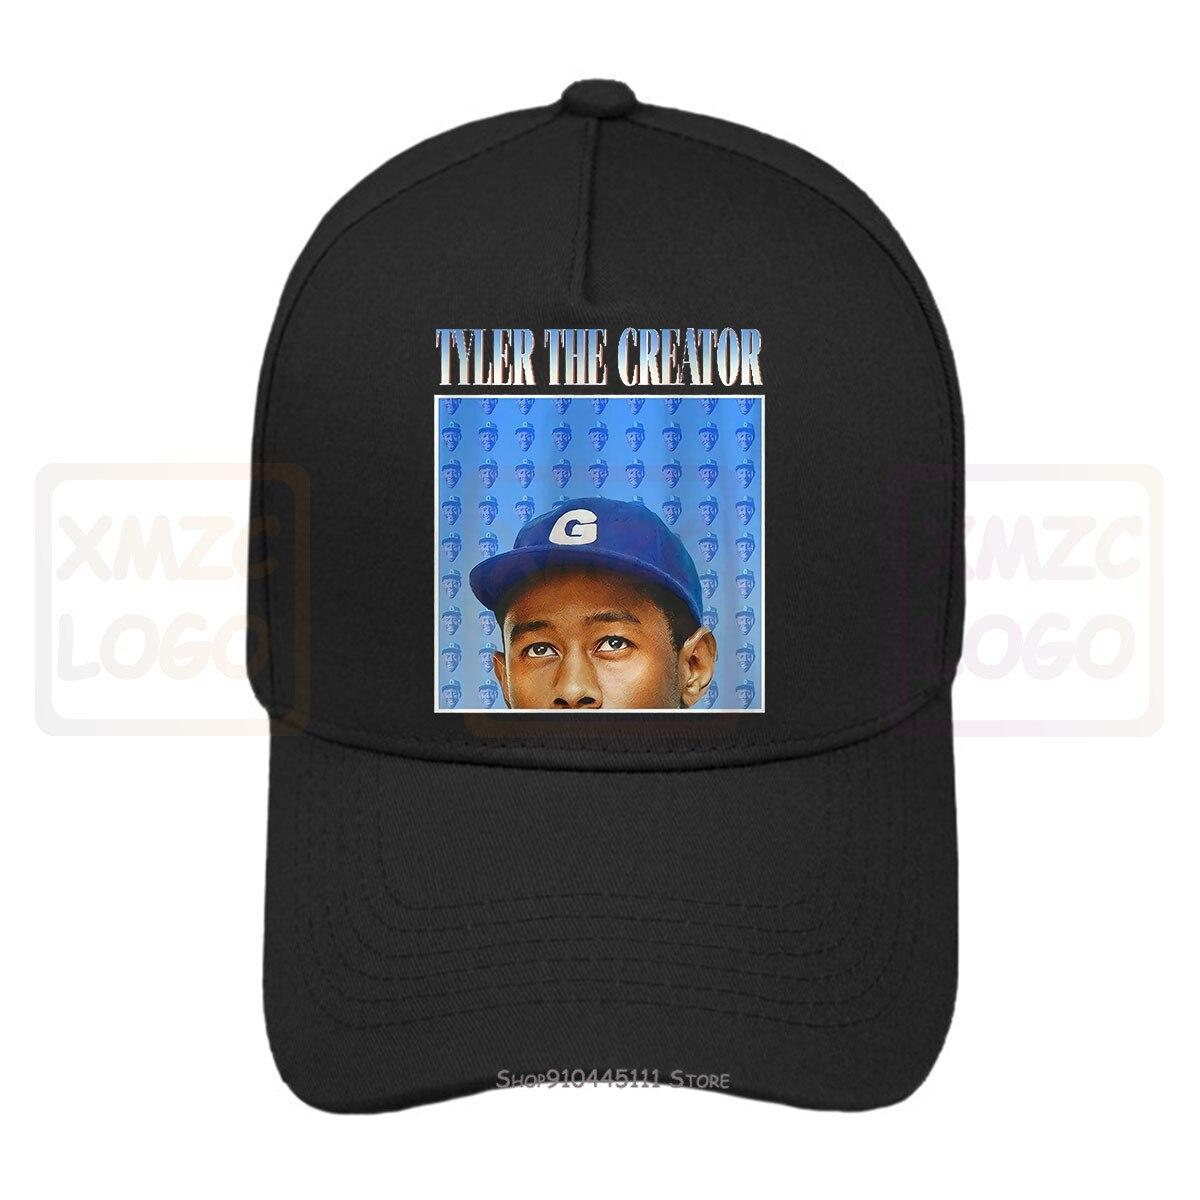 Tyler The Creator Baseball Cap